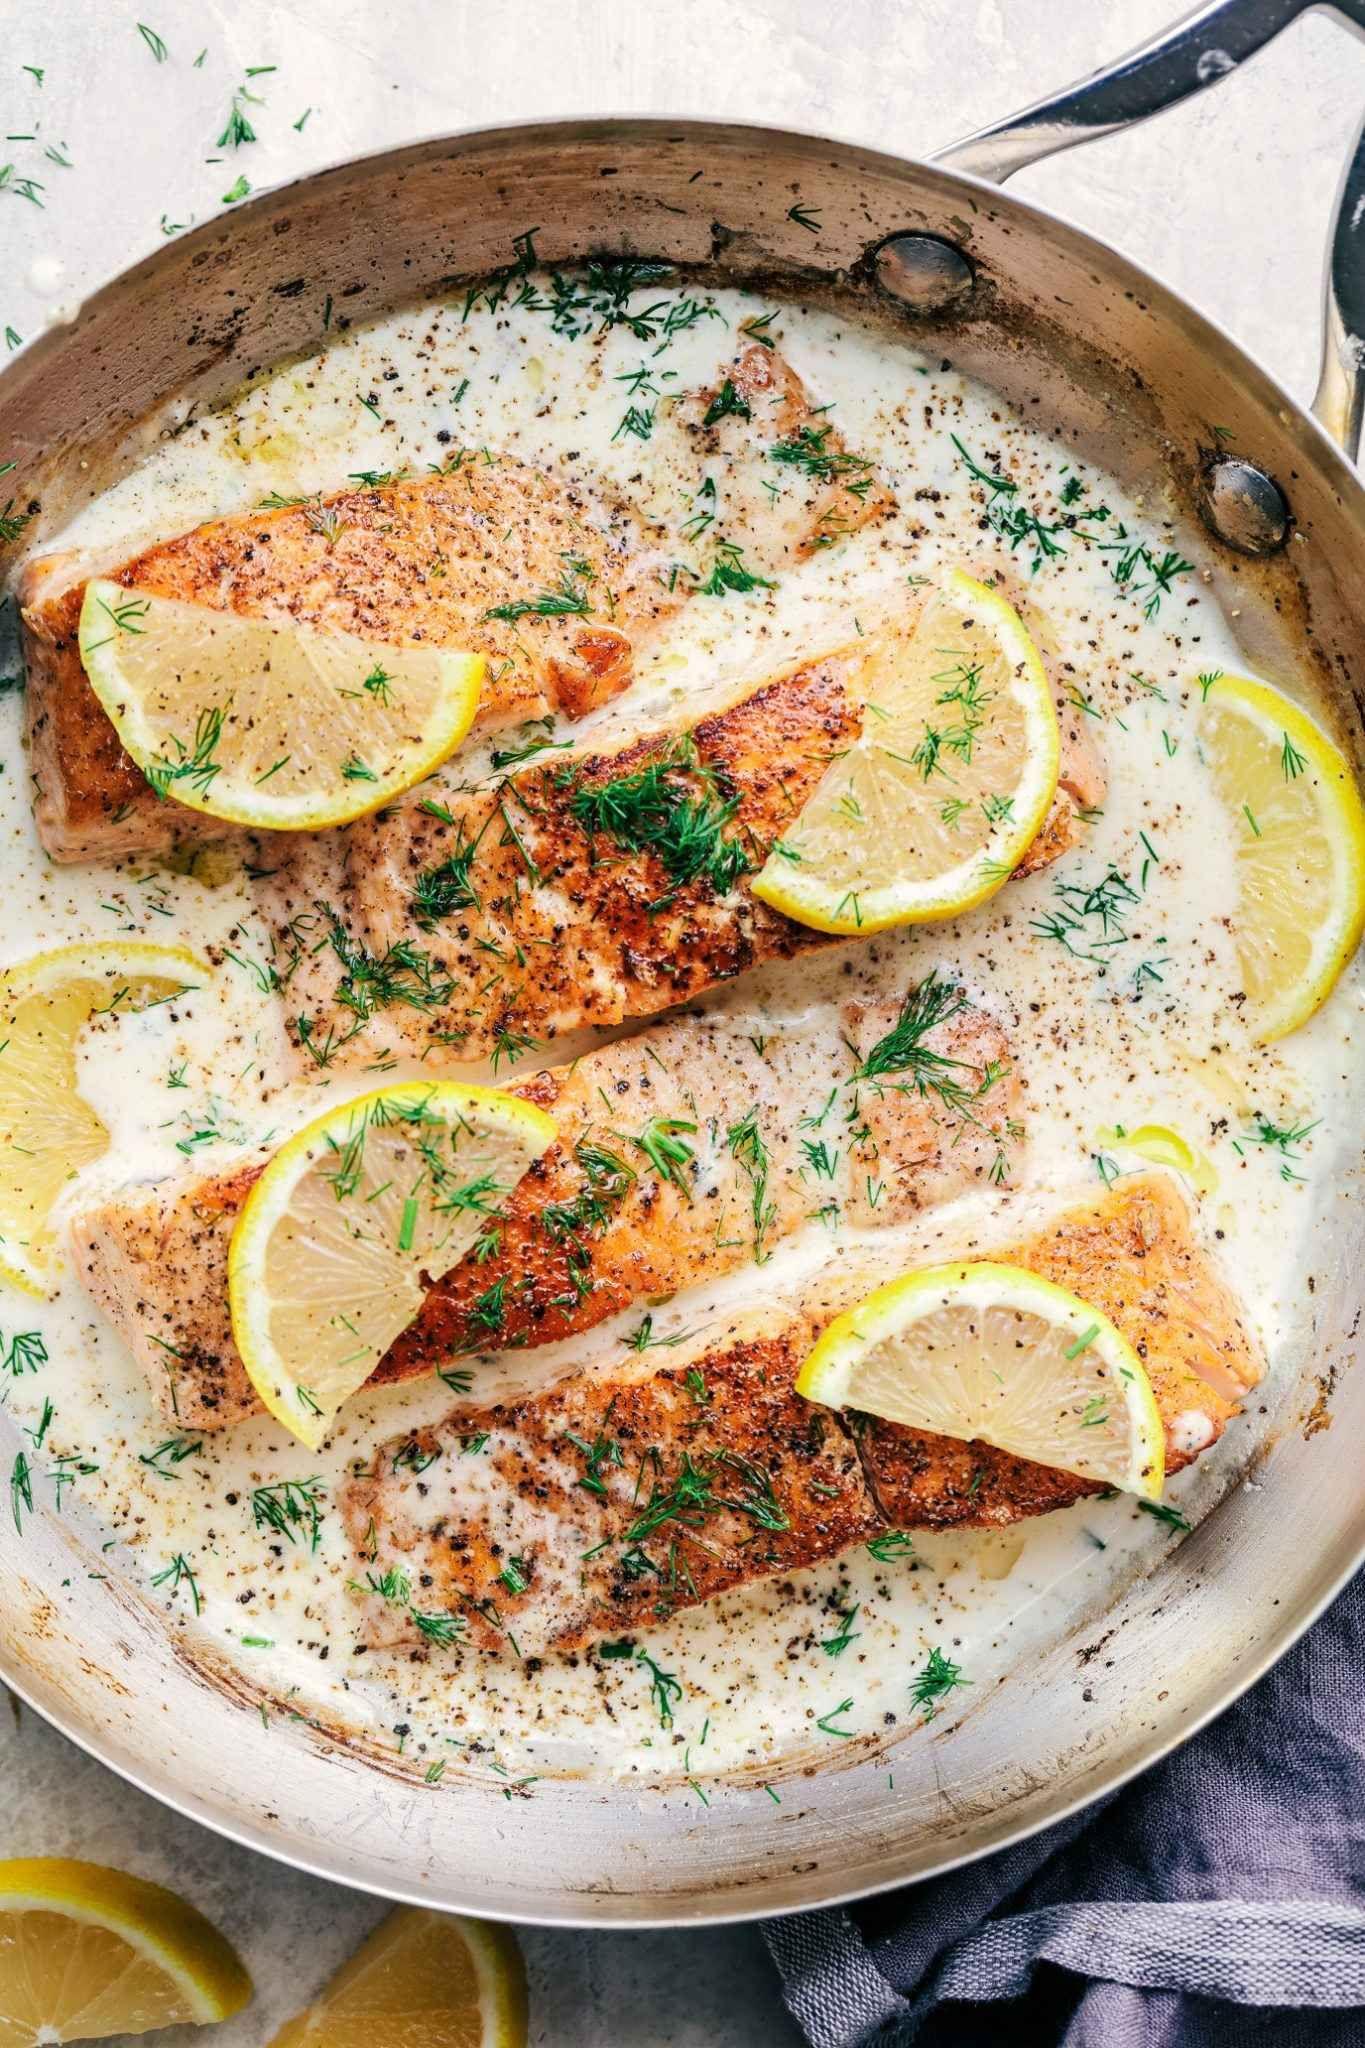 Photo of Pan-fried salmon with a creamy lemon-dill sauce – Recipes De